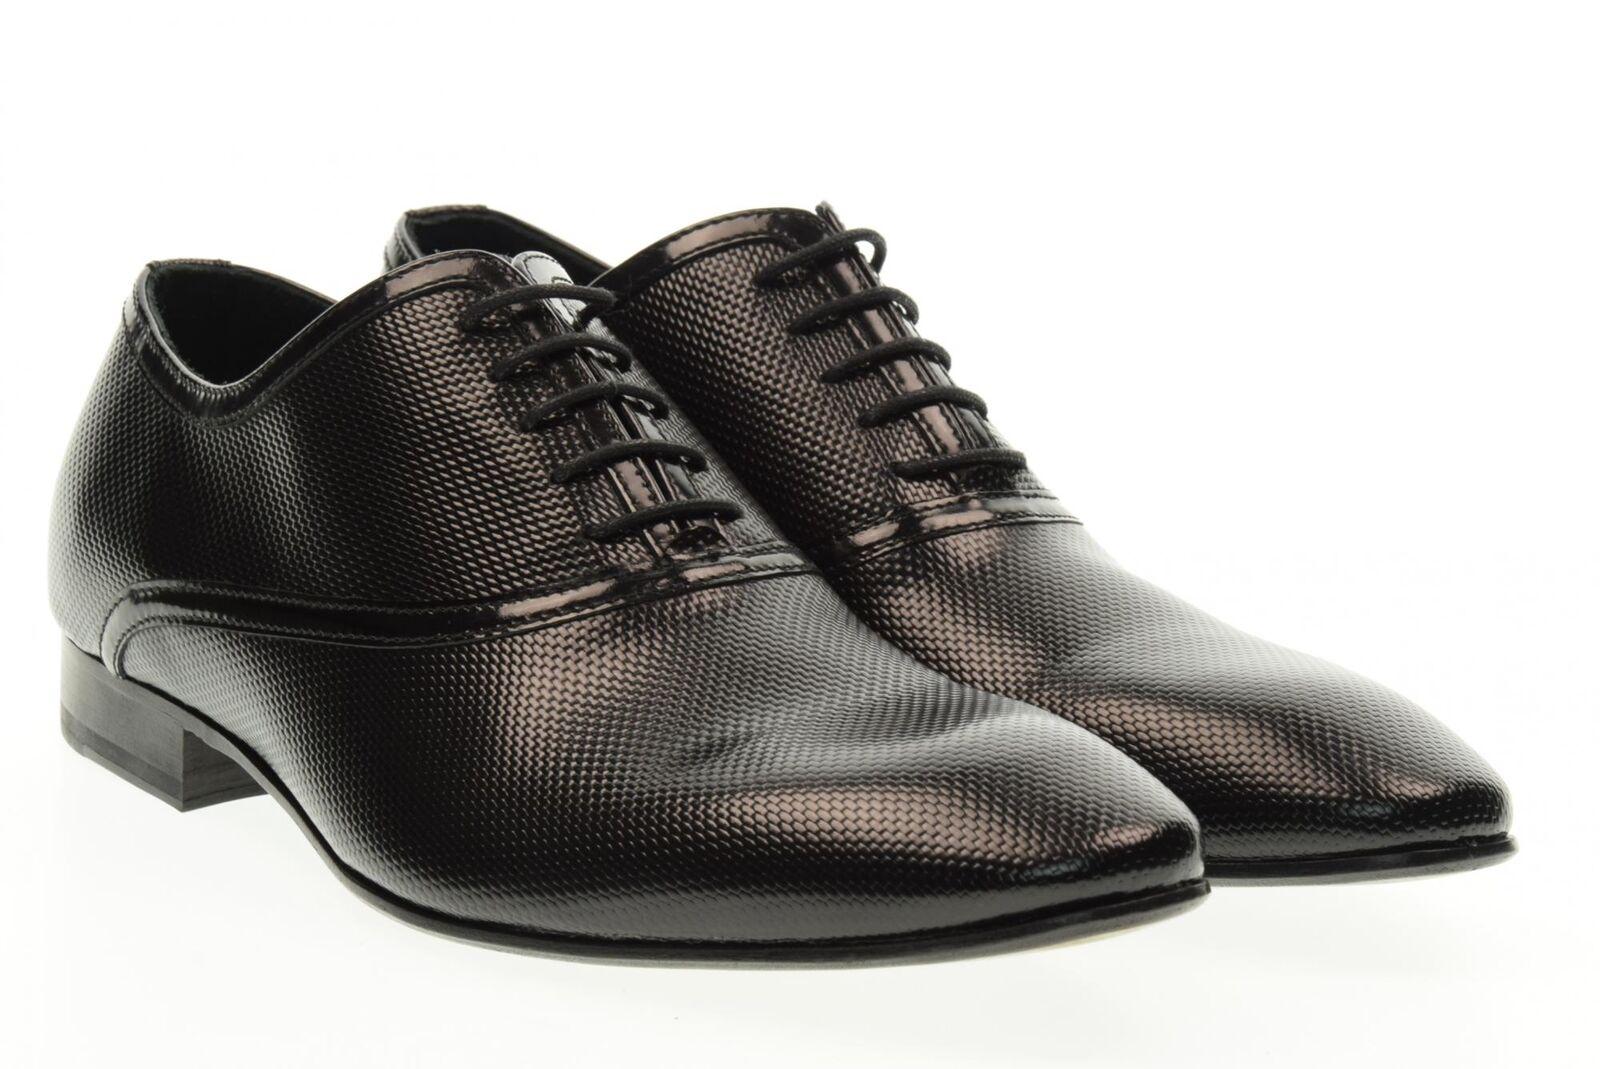 Eveet P17s zapatos de hombre de encaje 16519